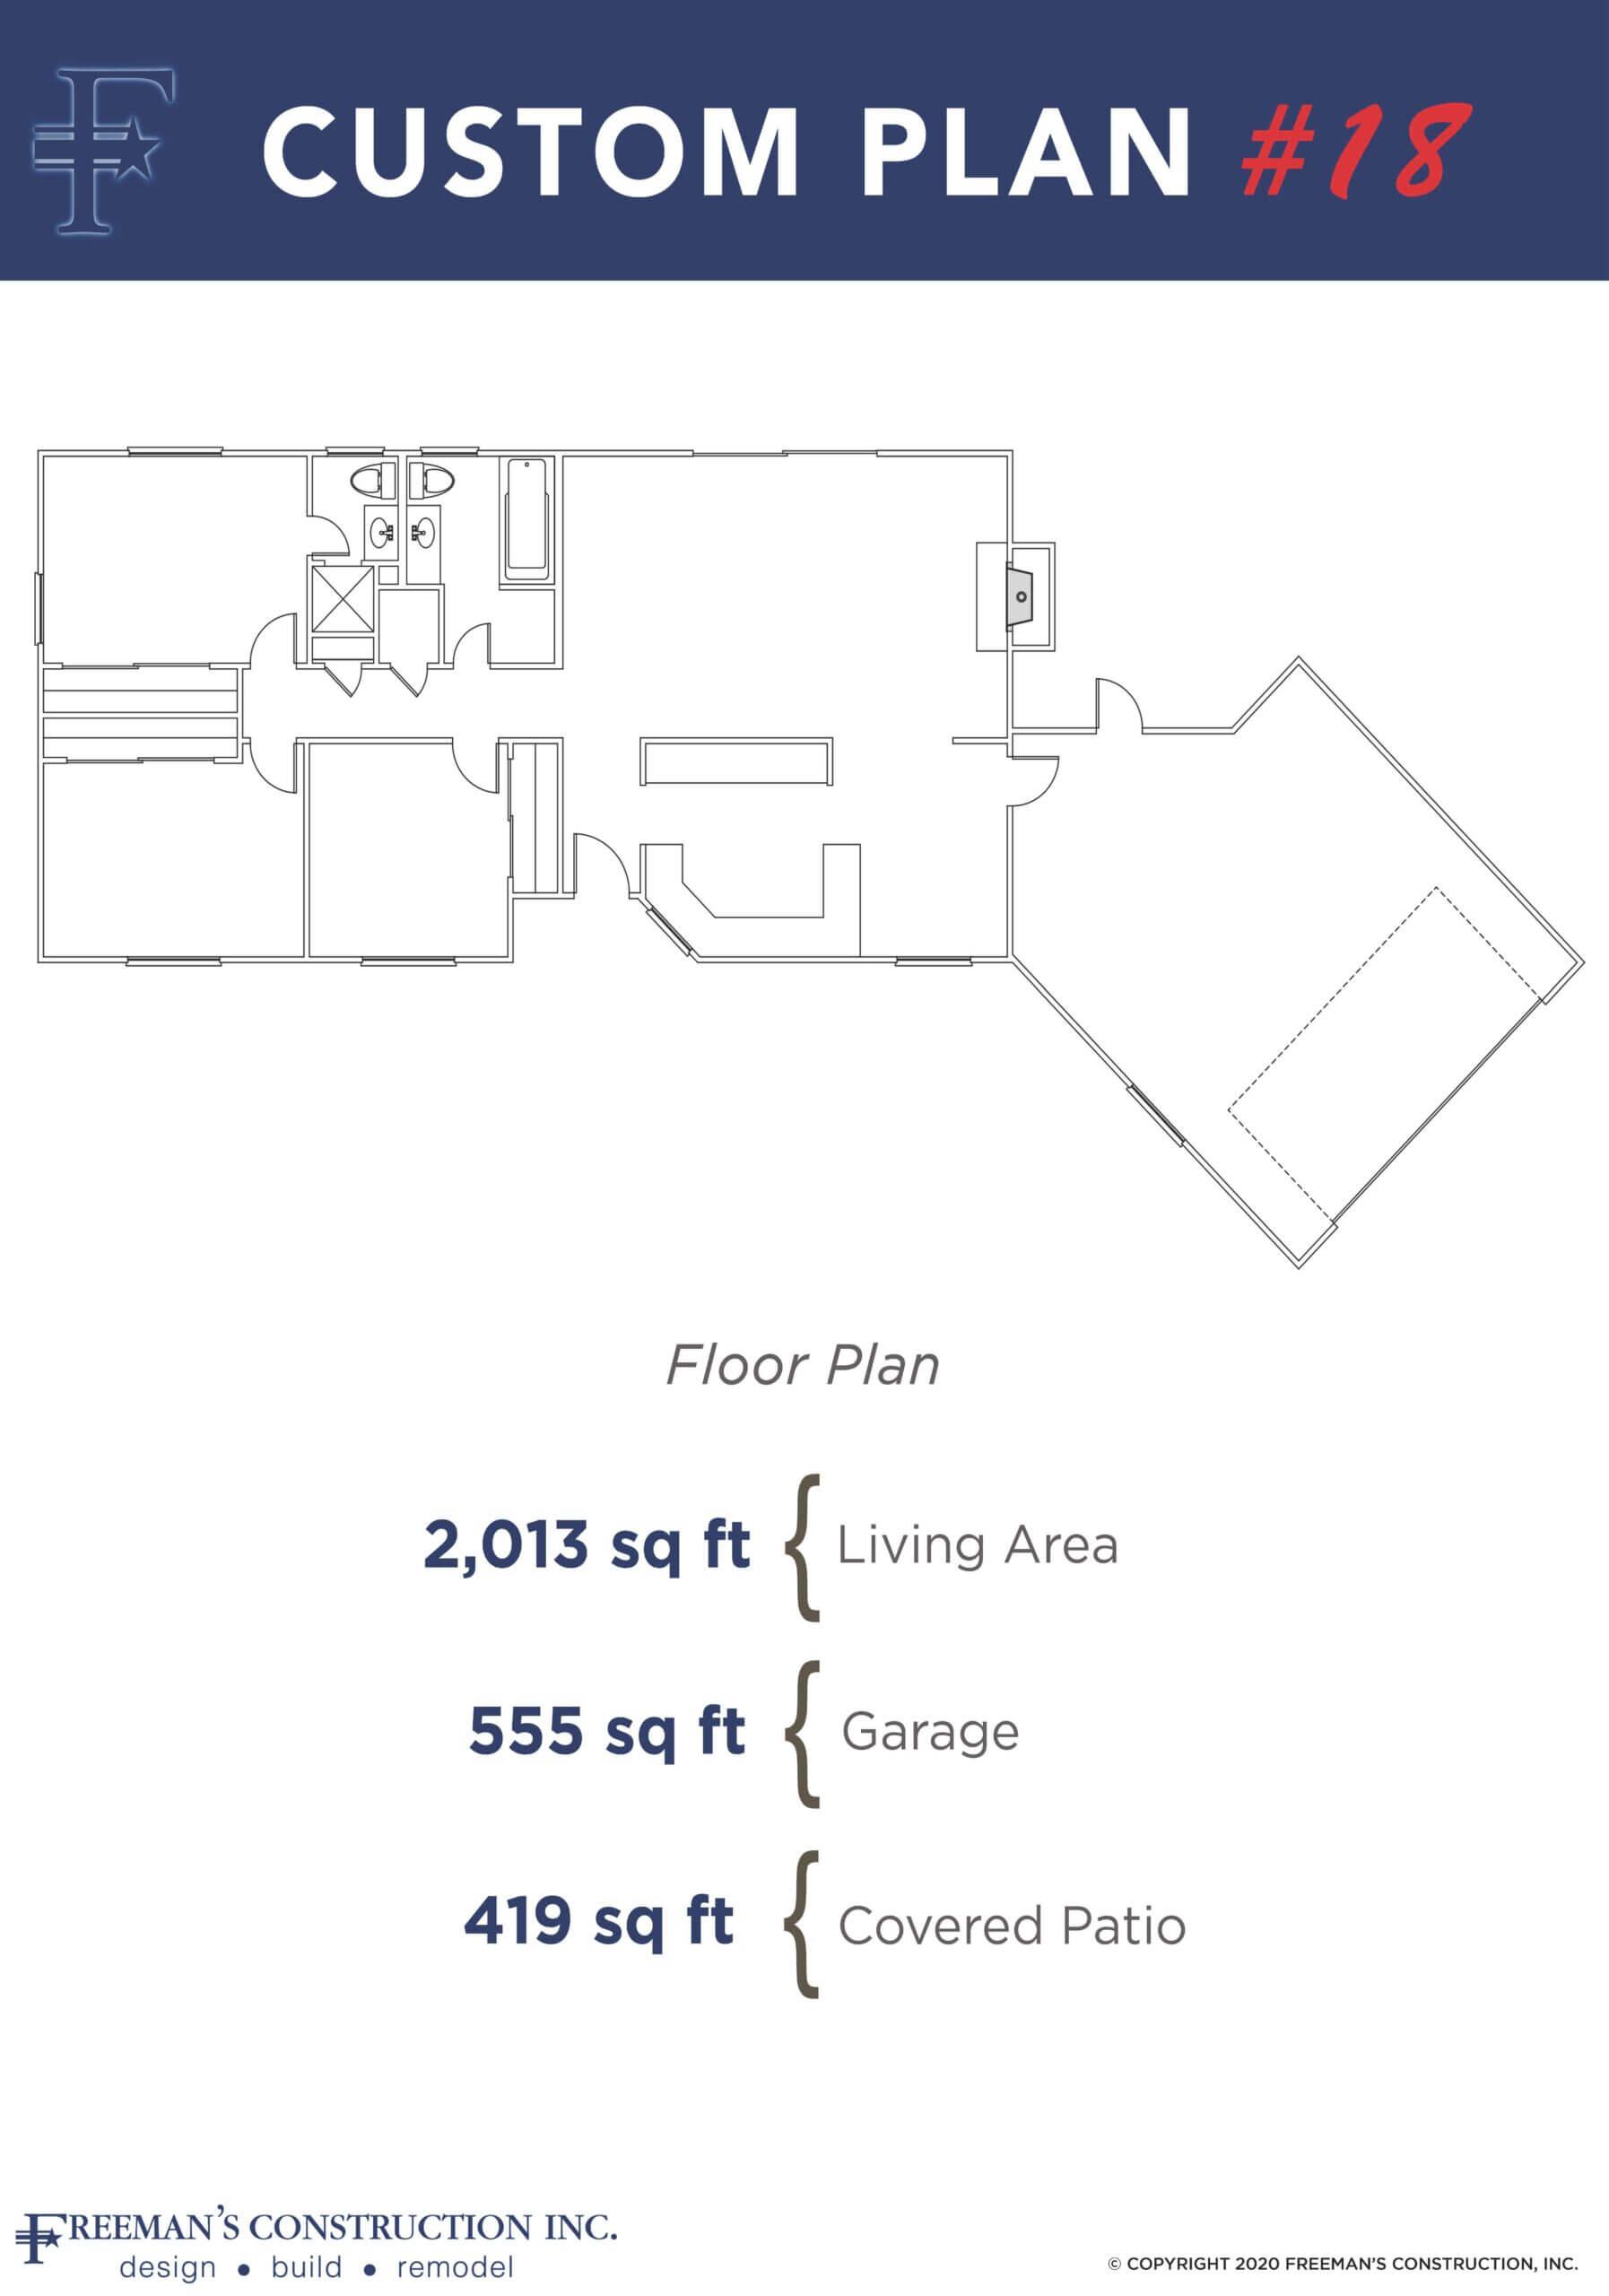 custom-home-floor-plan-18-freemans-construction-inc